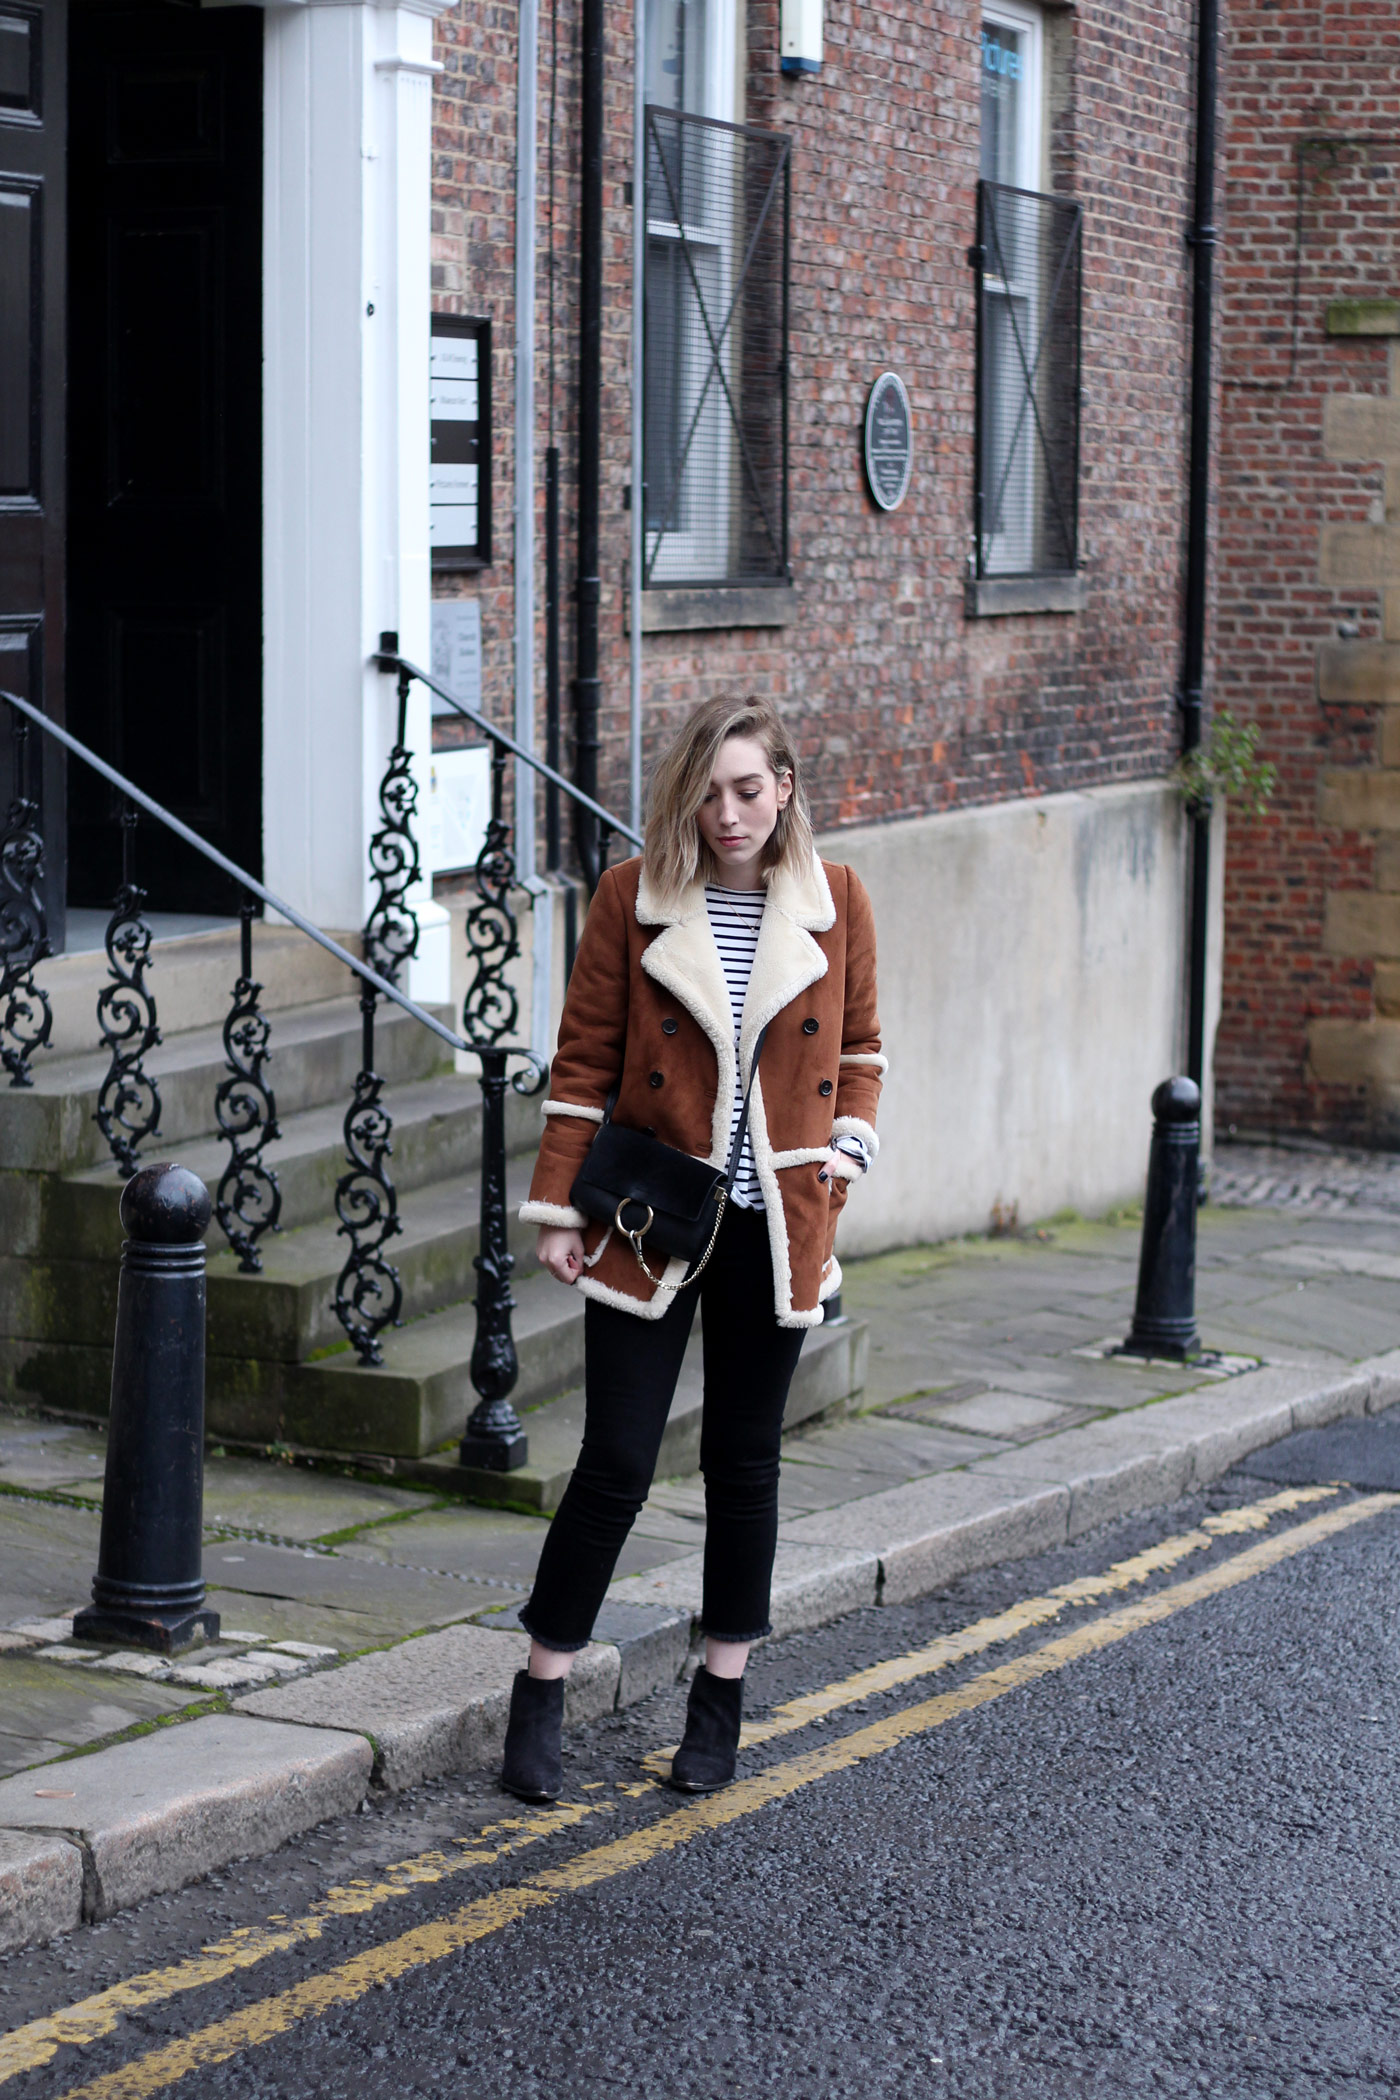 topshop-sheepskin-vintage-coat-chloe-faye-black-acne-jensen-suede